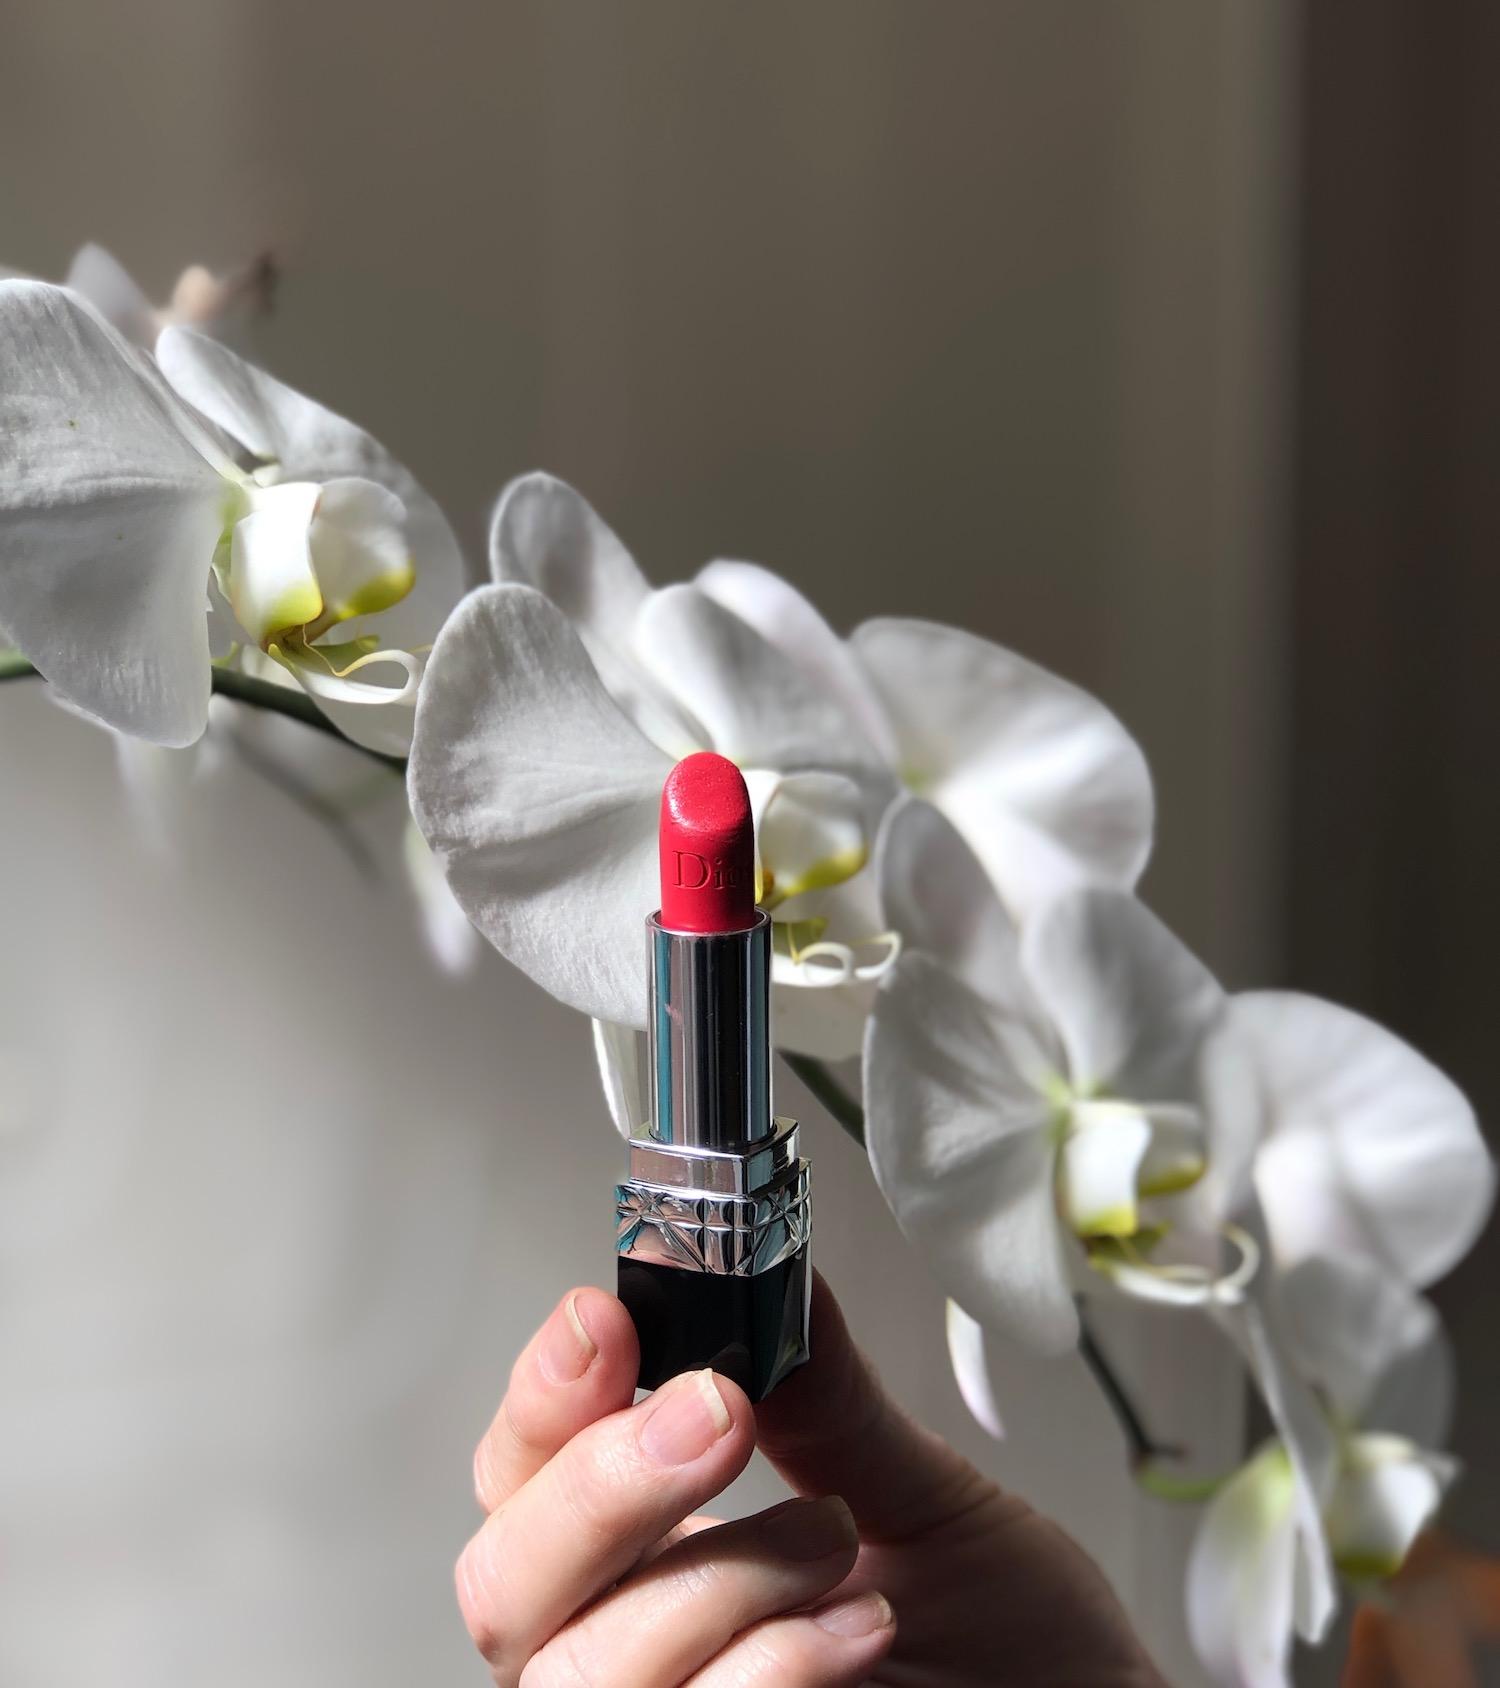 Dior #775 Darling Lipstick